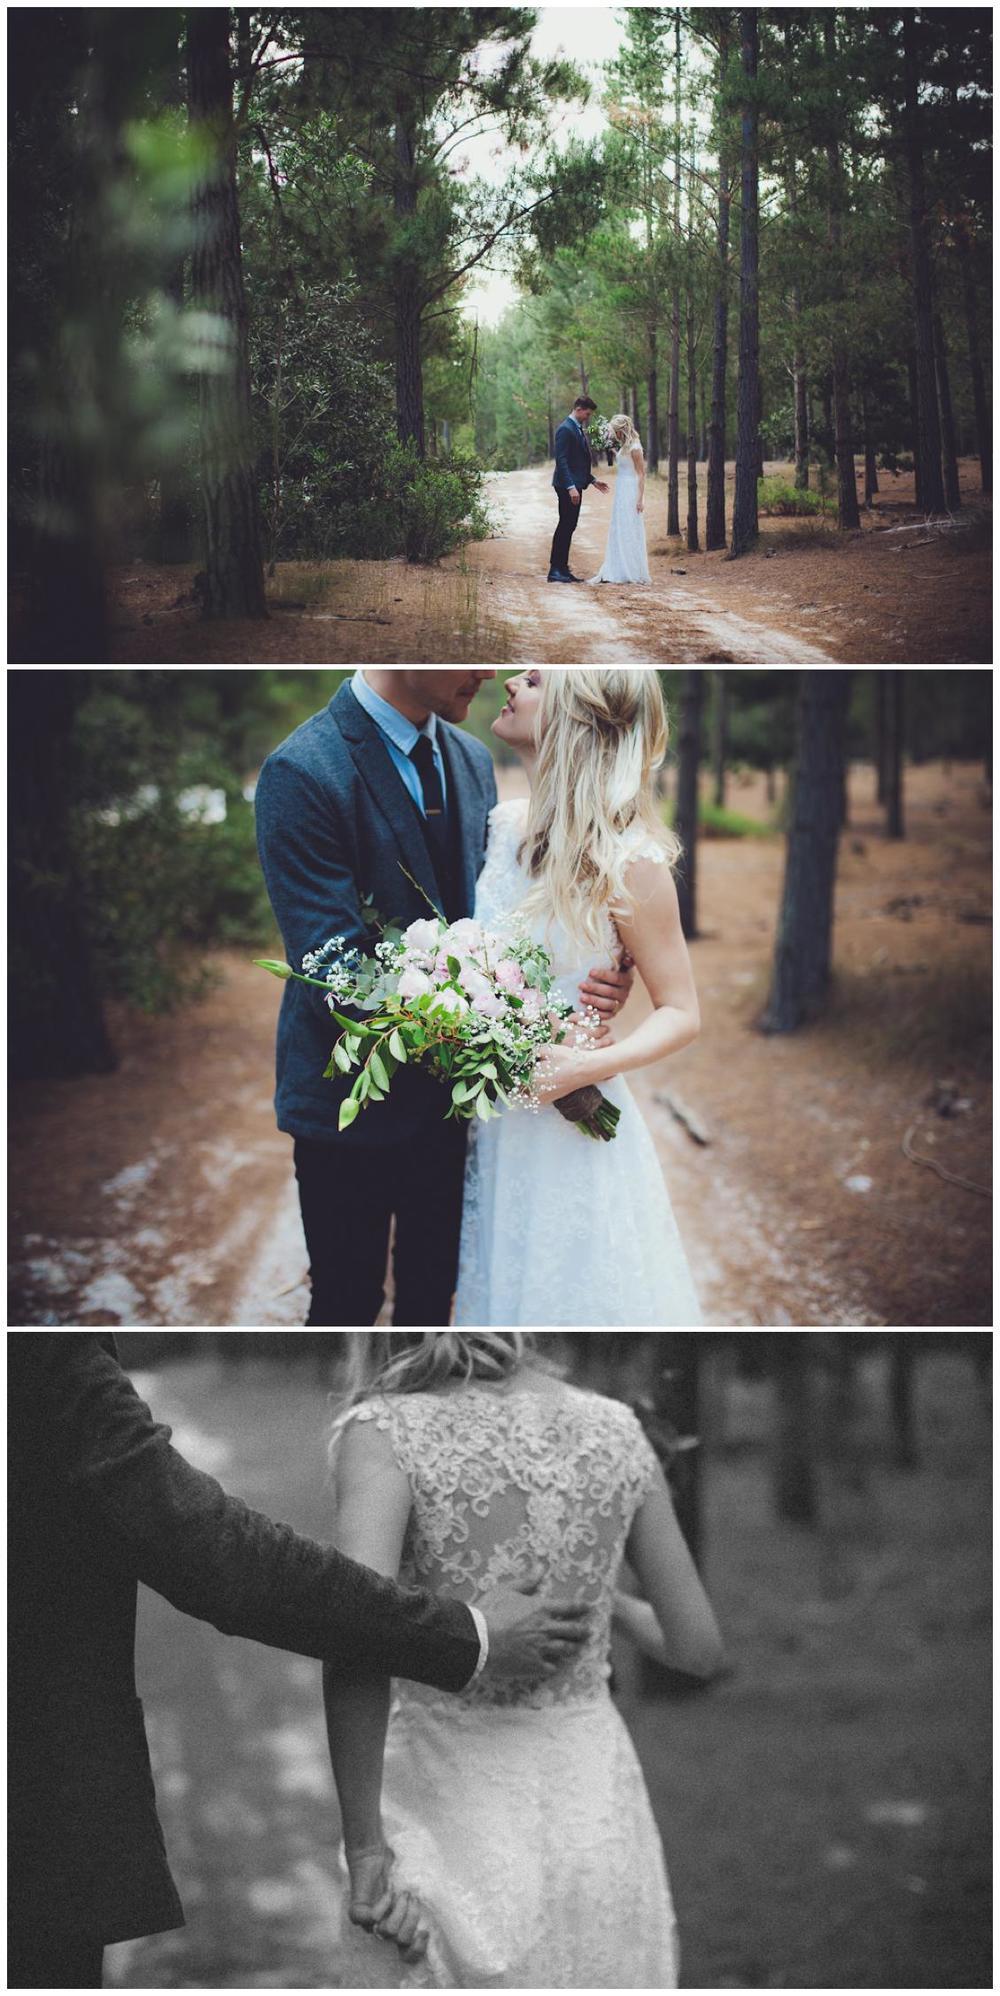 Wessel&Clarissa_FionaClairPhotography-100.jpg